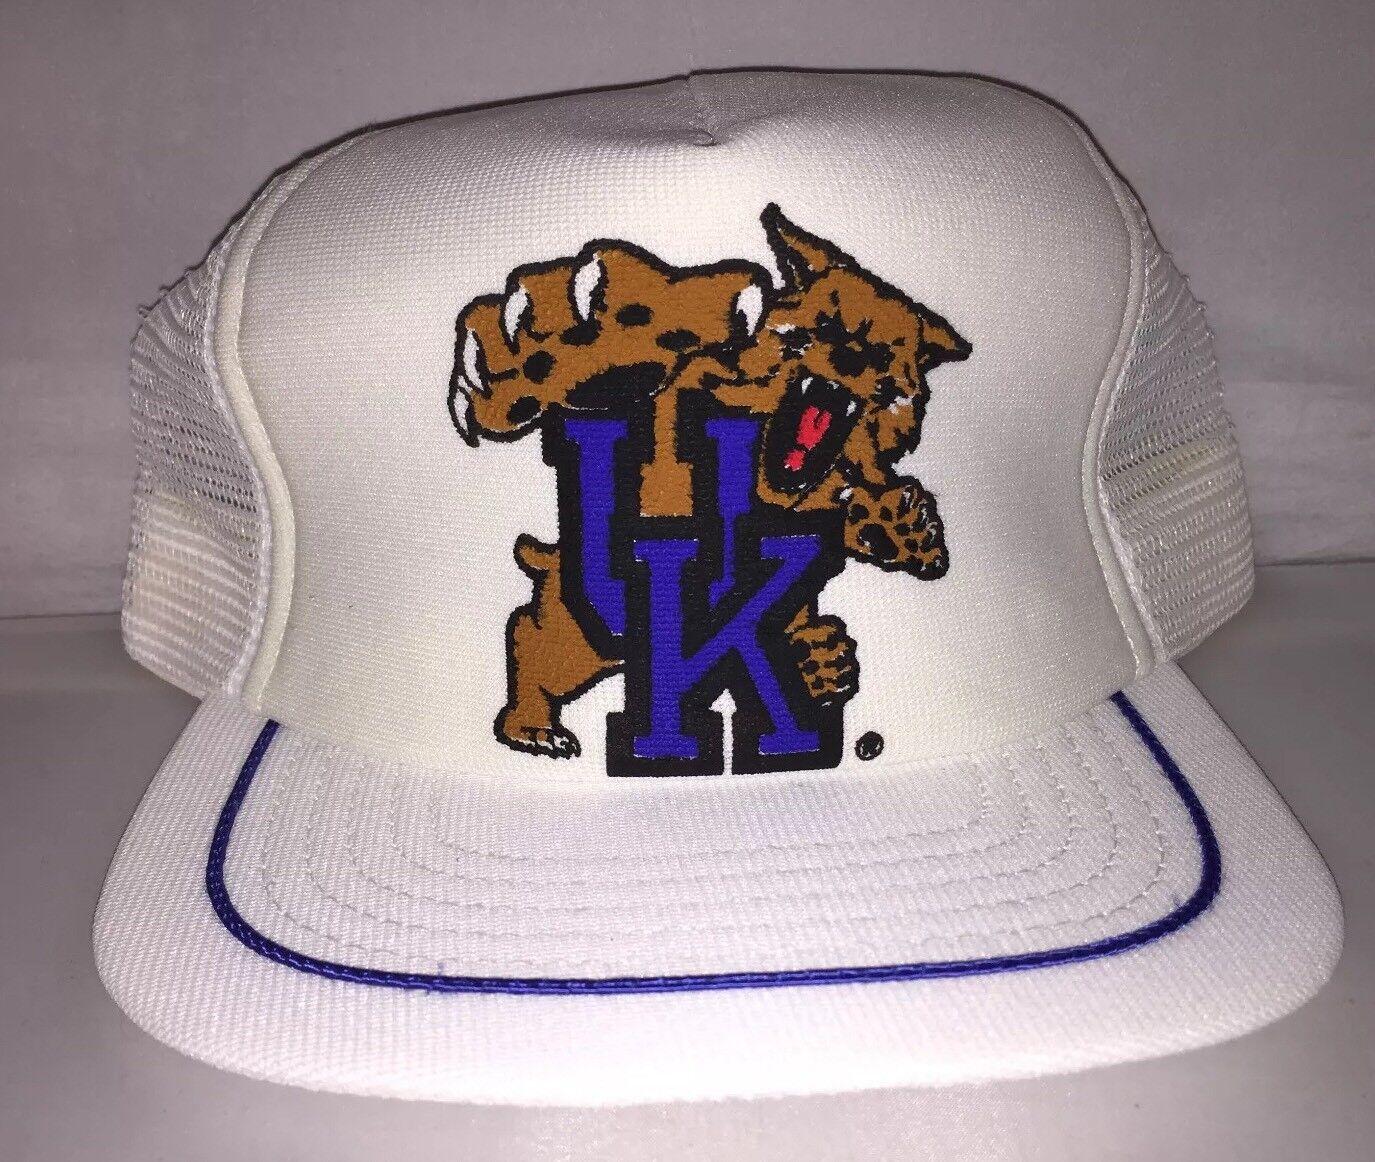 Vtg Kentucky Wildcats mesh 80s Snapback hat cap rare 80s mesh NCAA College rondo calipari ef43be